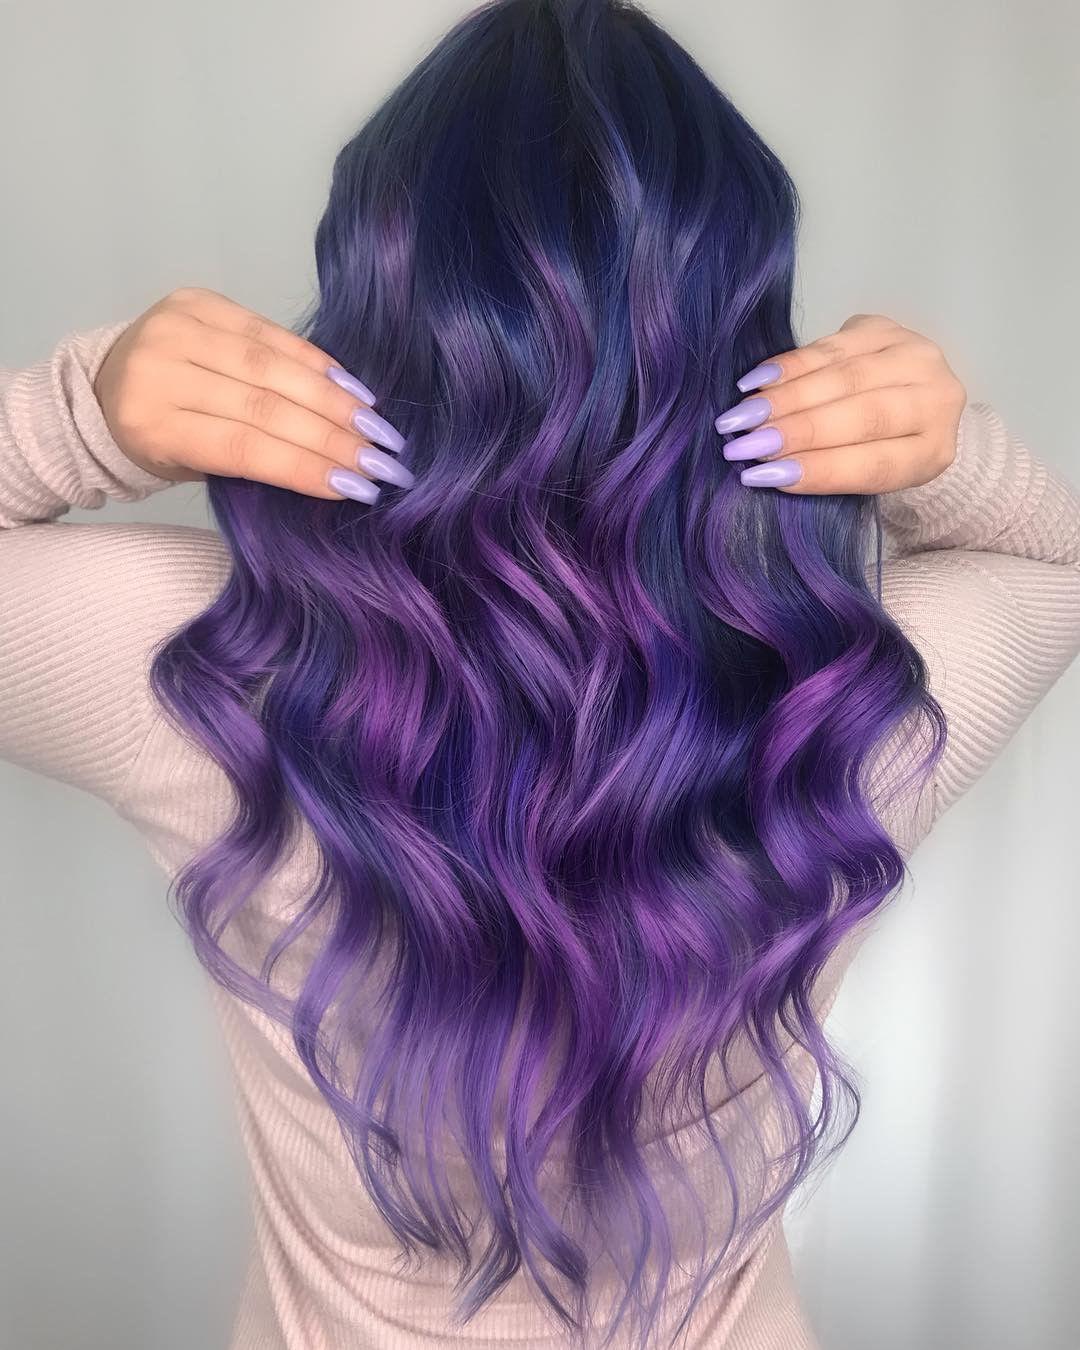 63 Purple Hair Color Ideas To Swoon Over Violet Purple Hair Dye Tips: VIVID VELVET Hair By @kimberlytayhair Lightener